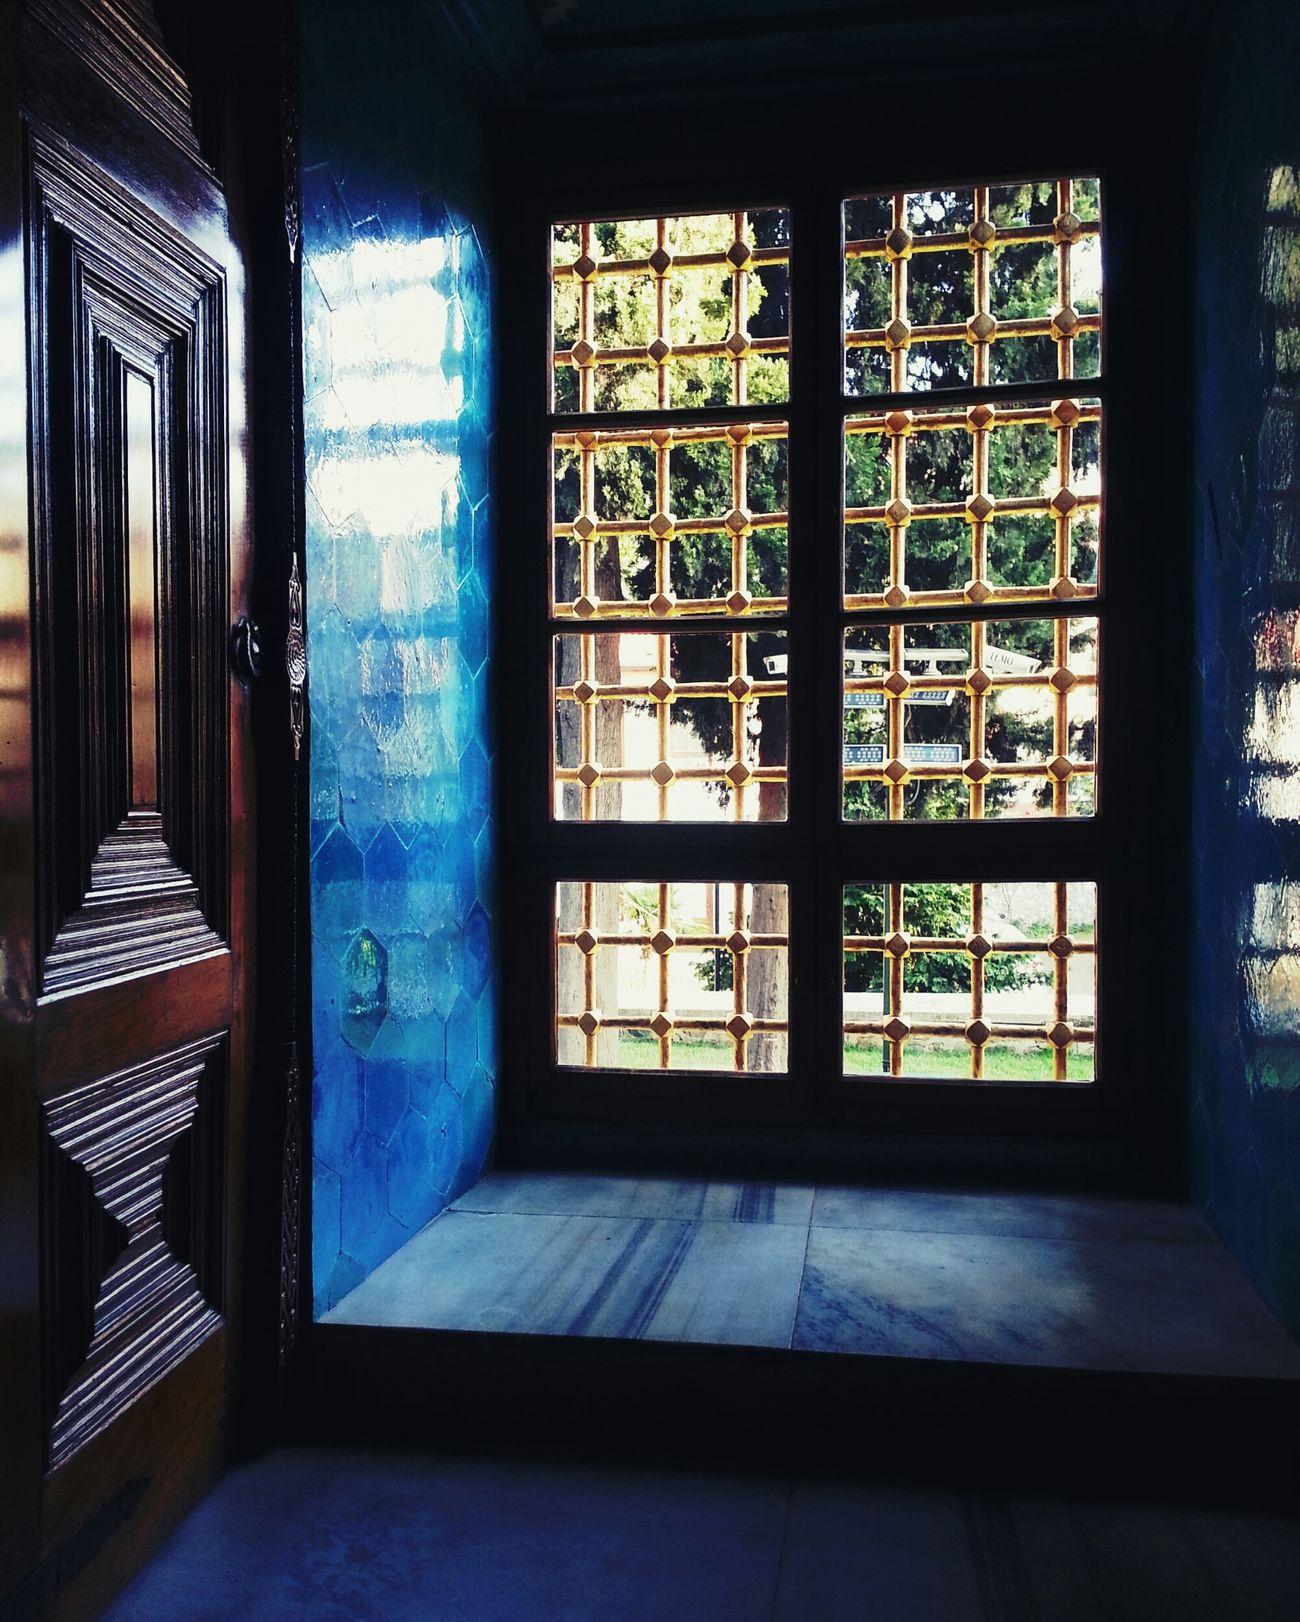 karanlığa sızan aydınlık. Window Mosque Lights Historical Building